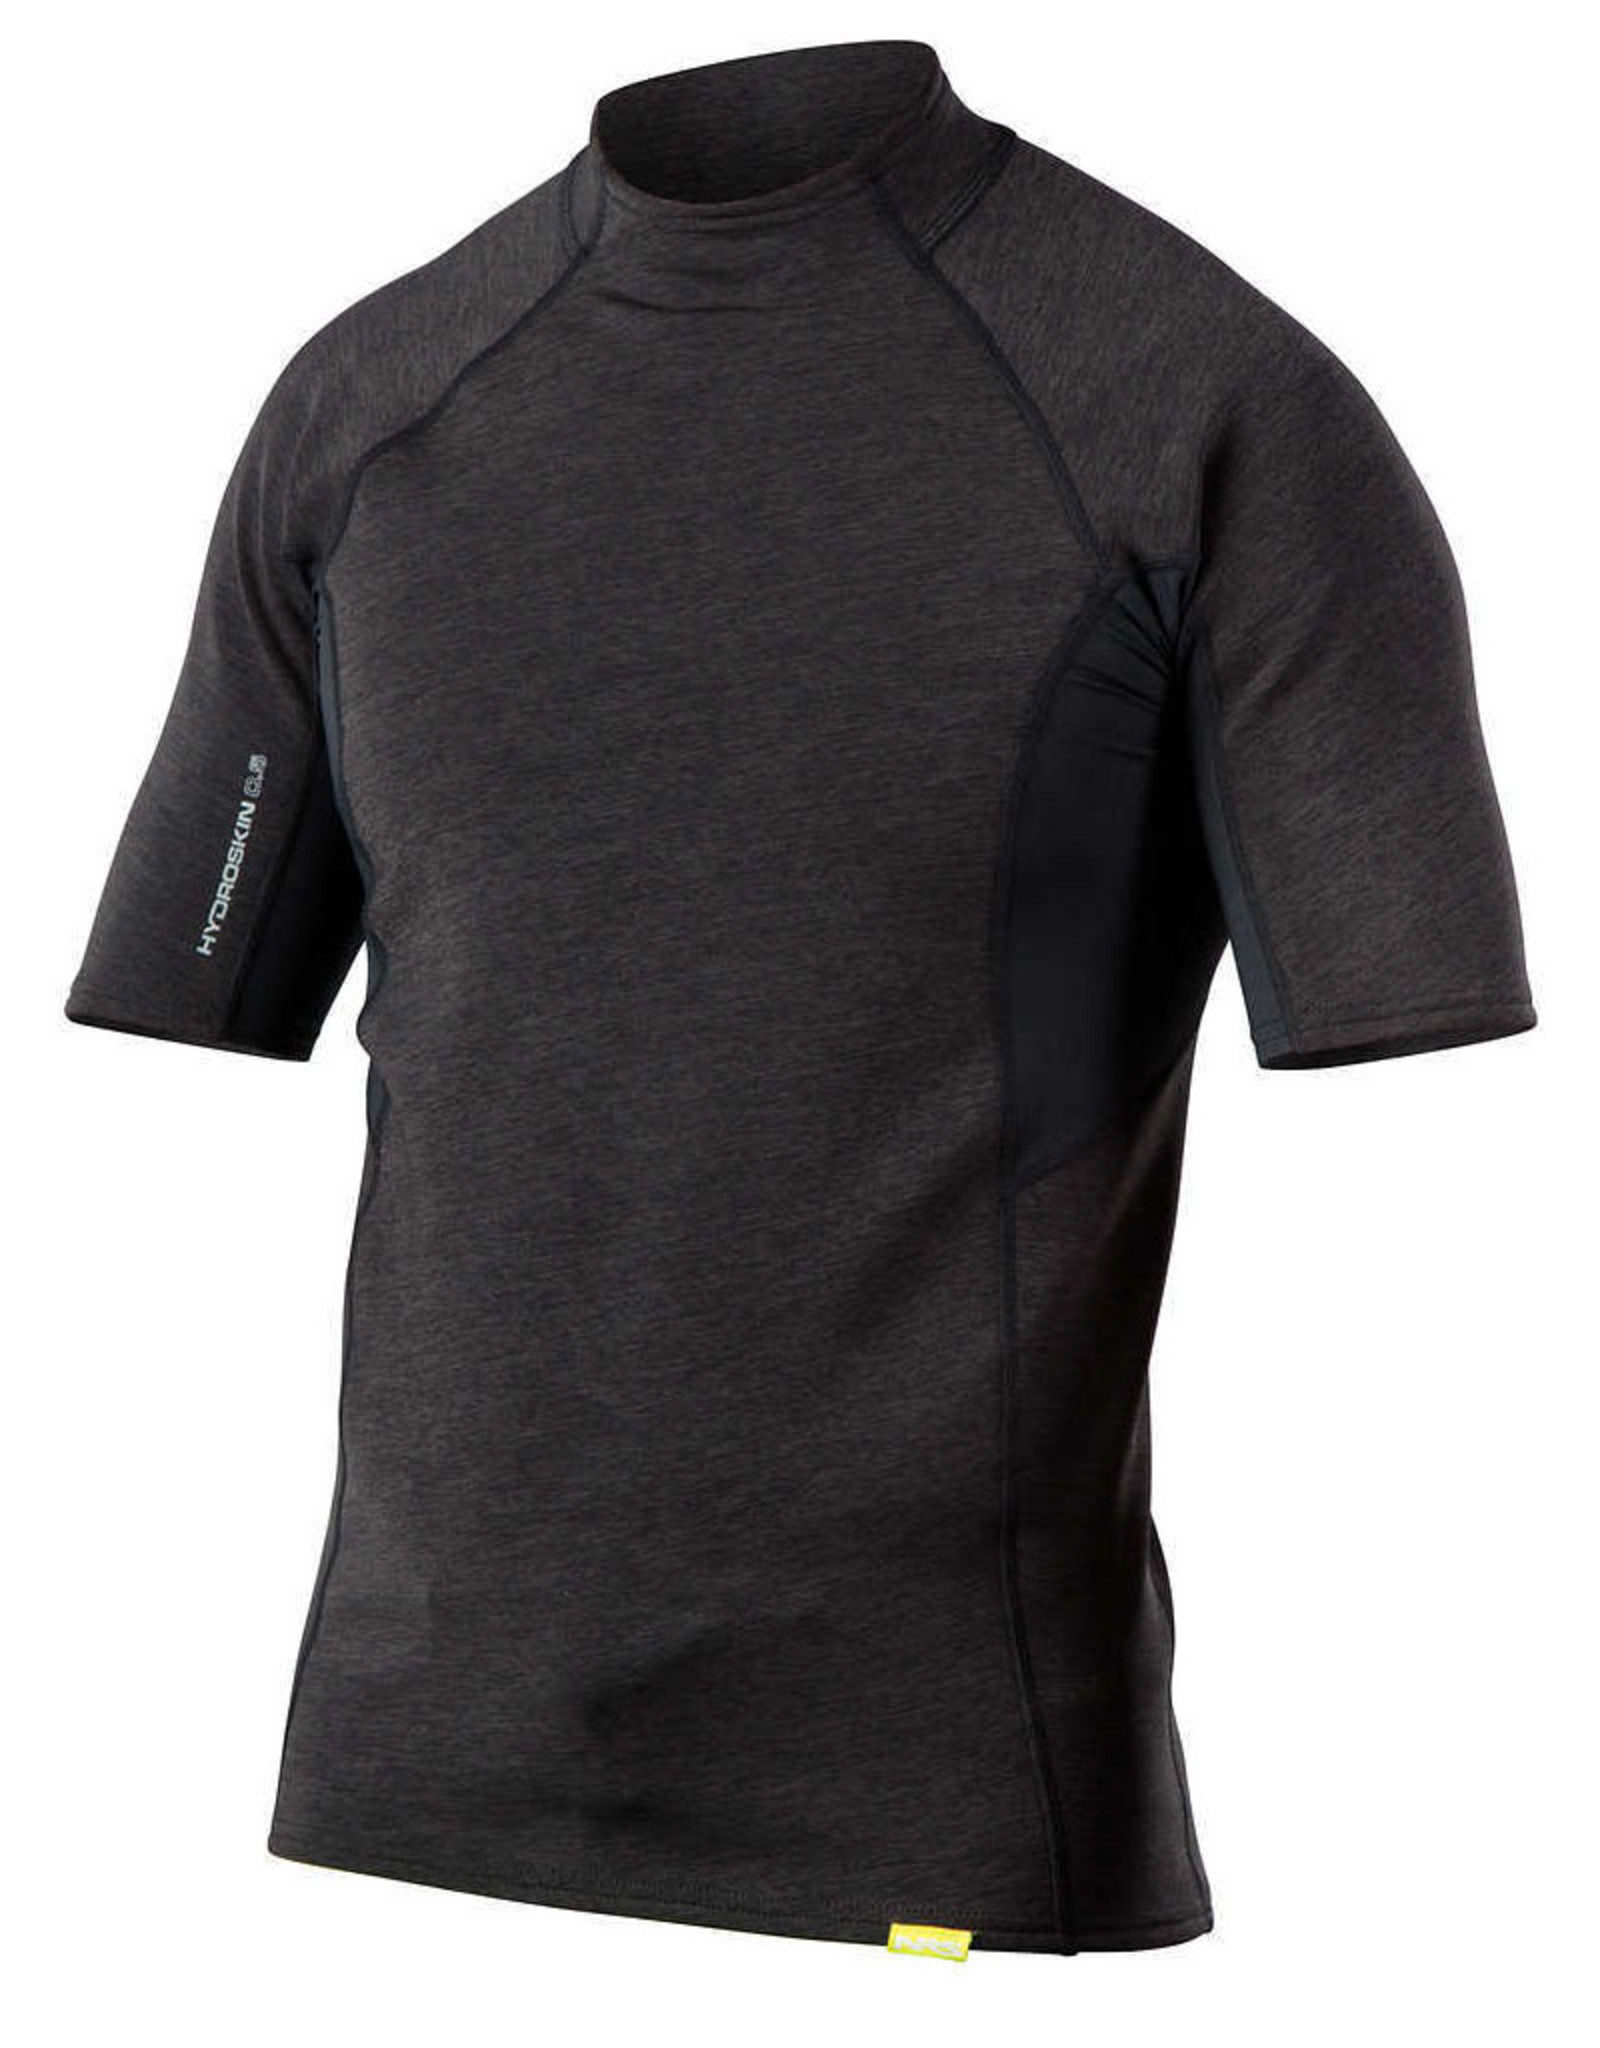 NRS NRS Hydroskin 0.5 S/S Shirt - Mens